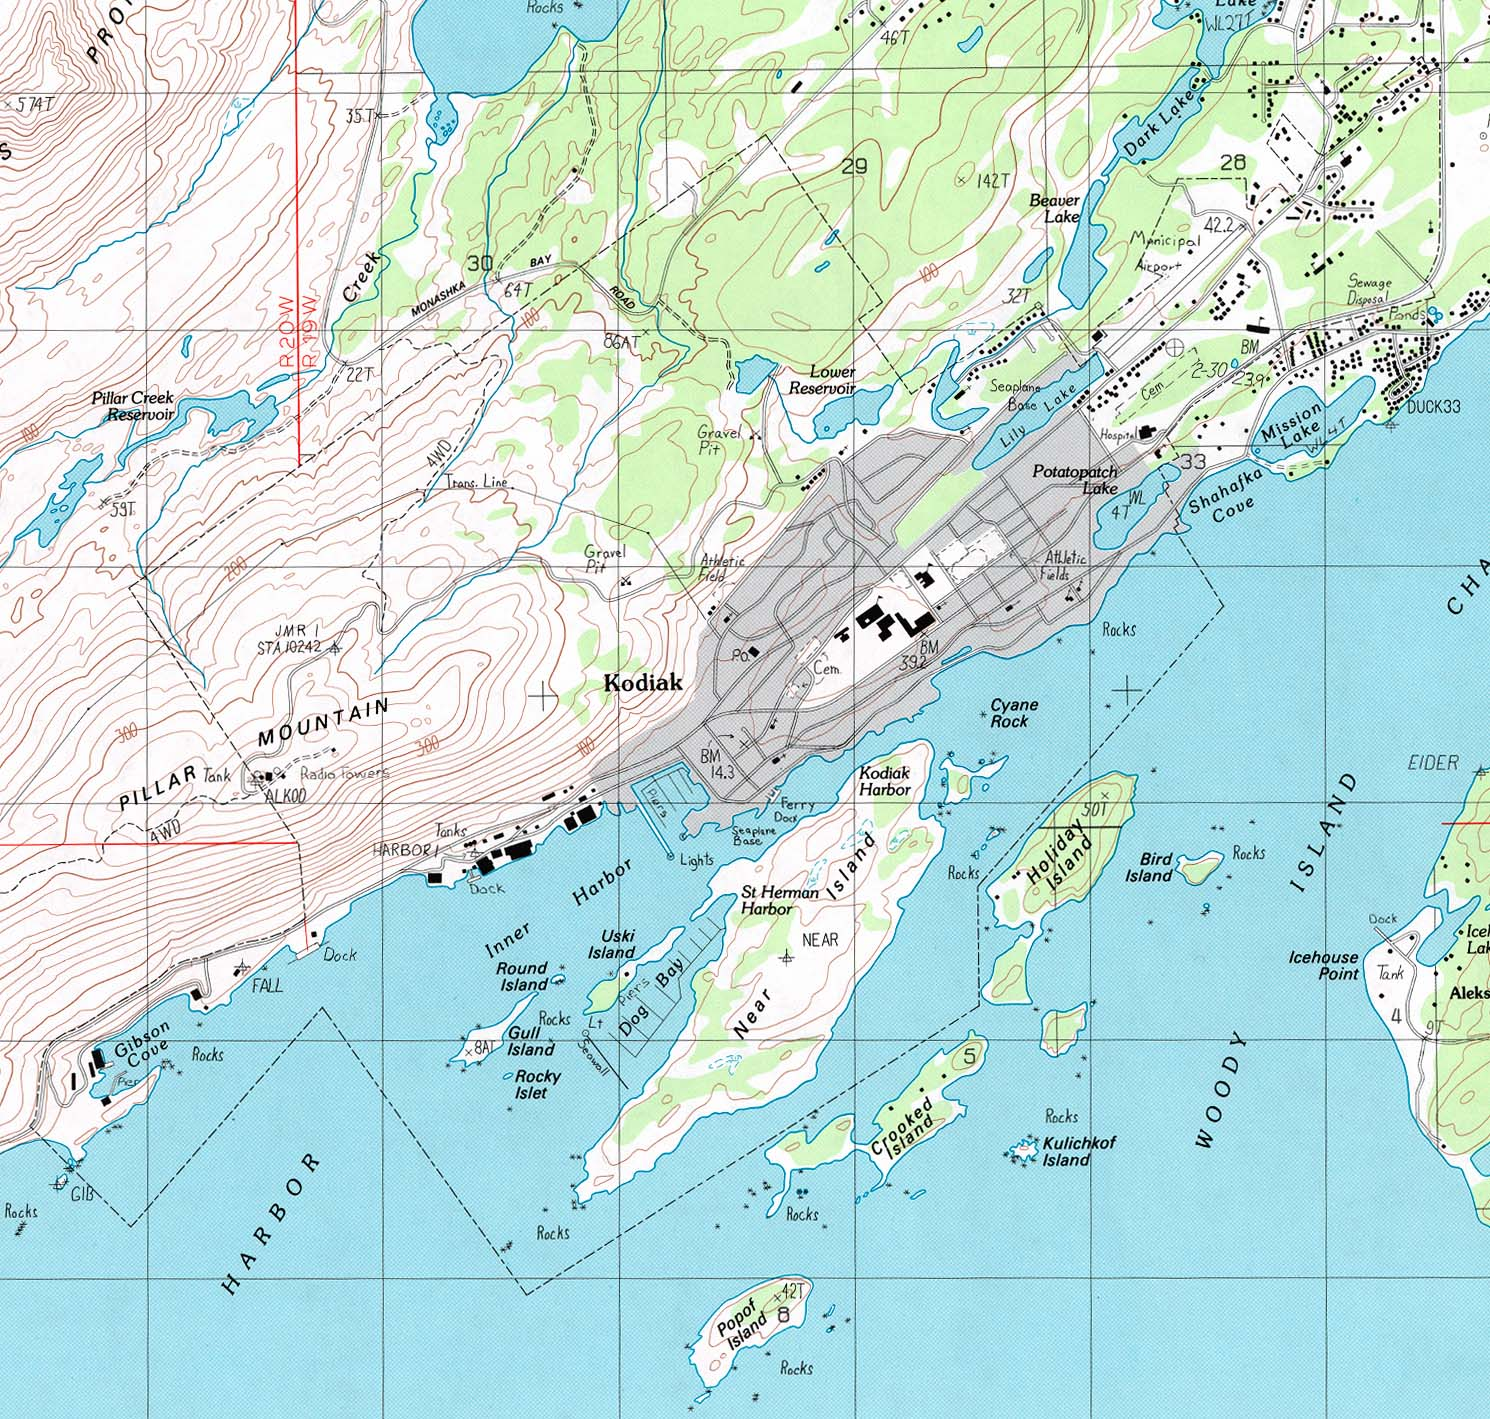 Alaska Maps PerryCastañeda Map Collection UT Library Online - Alaska map with cities